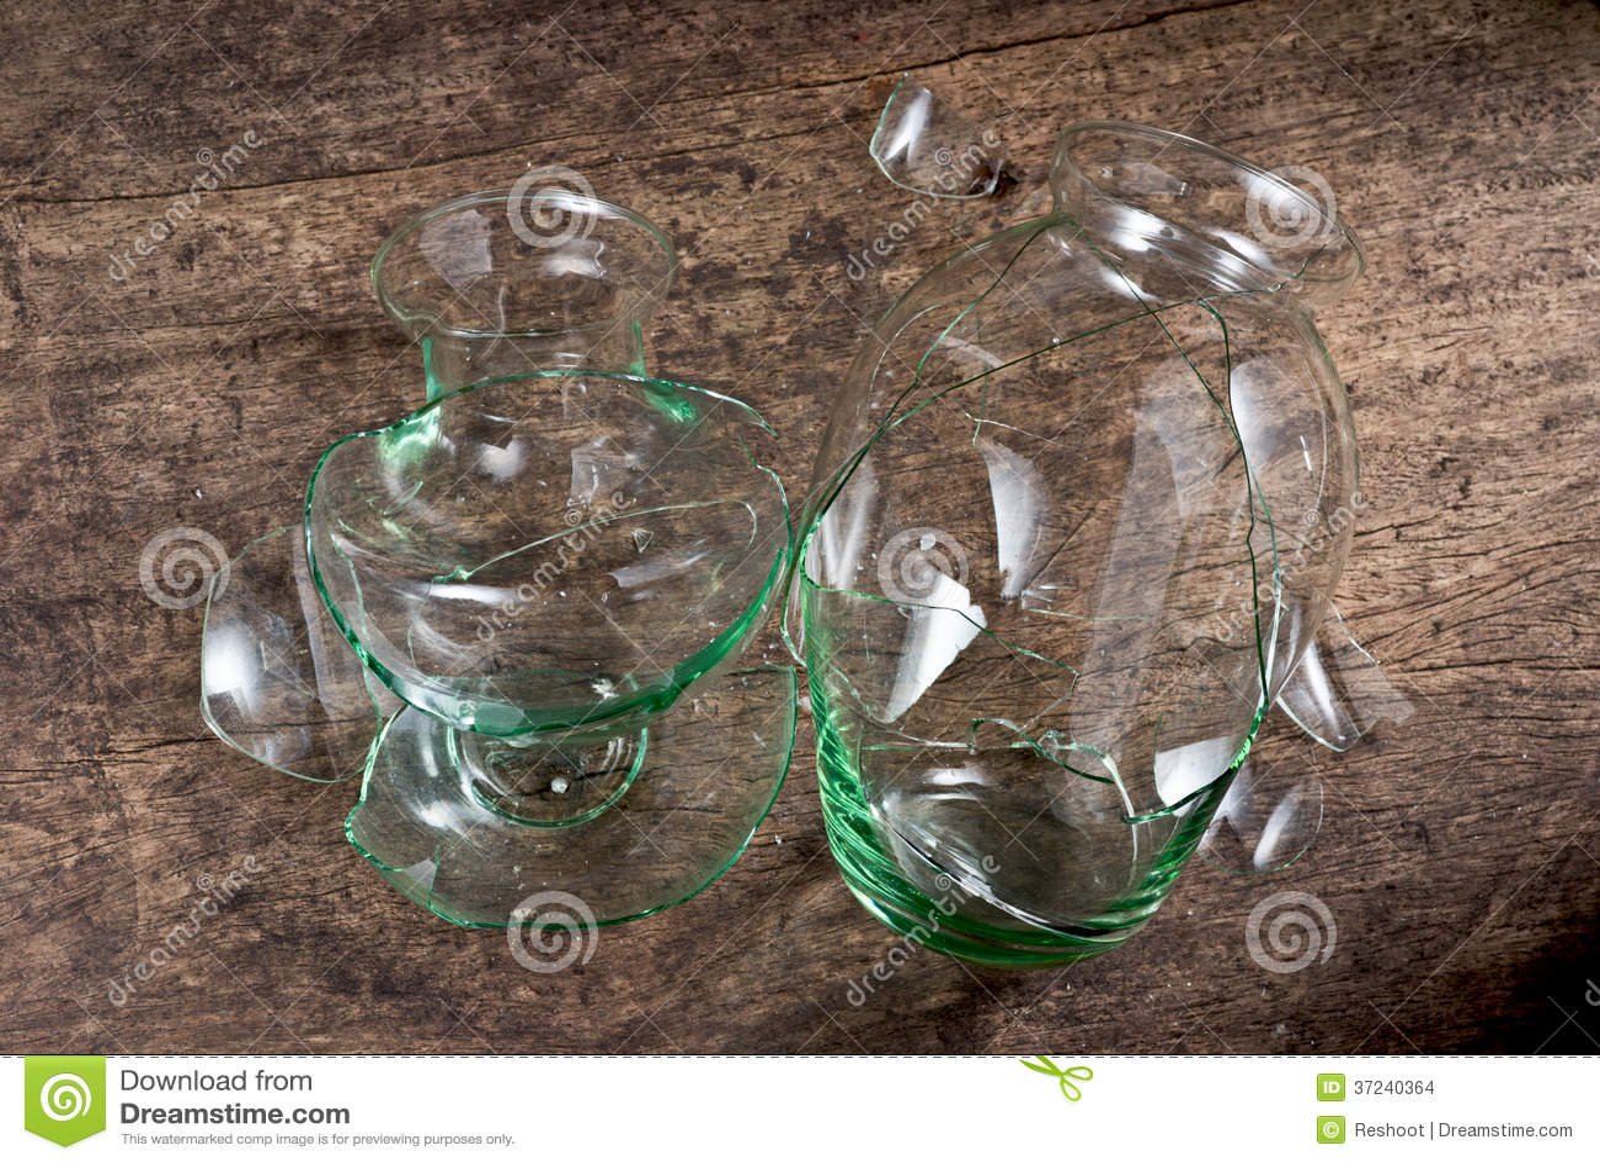 royalty free stock photo download broken glass - Broken Glass Vase